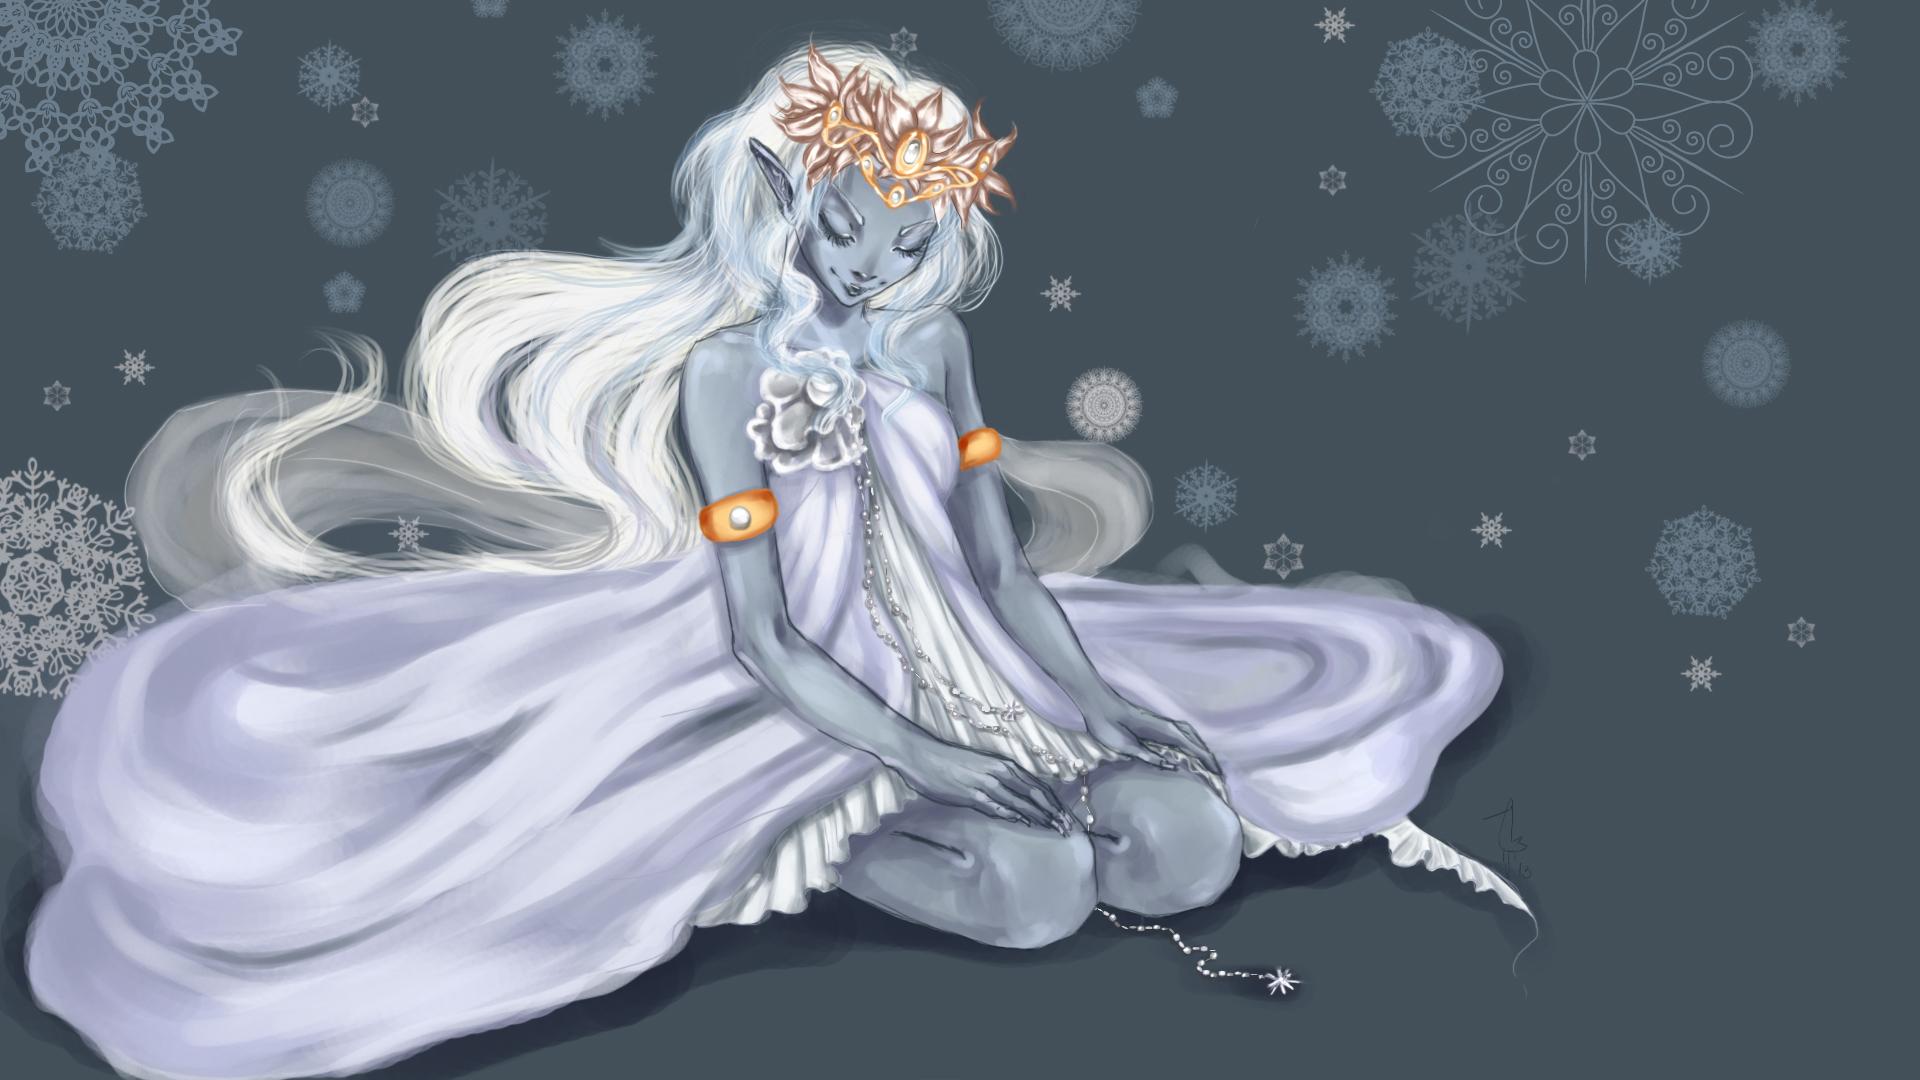 Snow Elf - Wallpaper, High Definition, High Quality, Widescreen